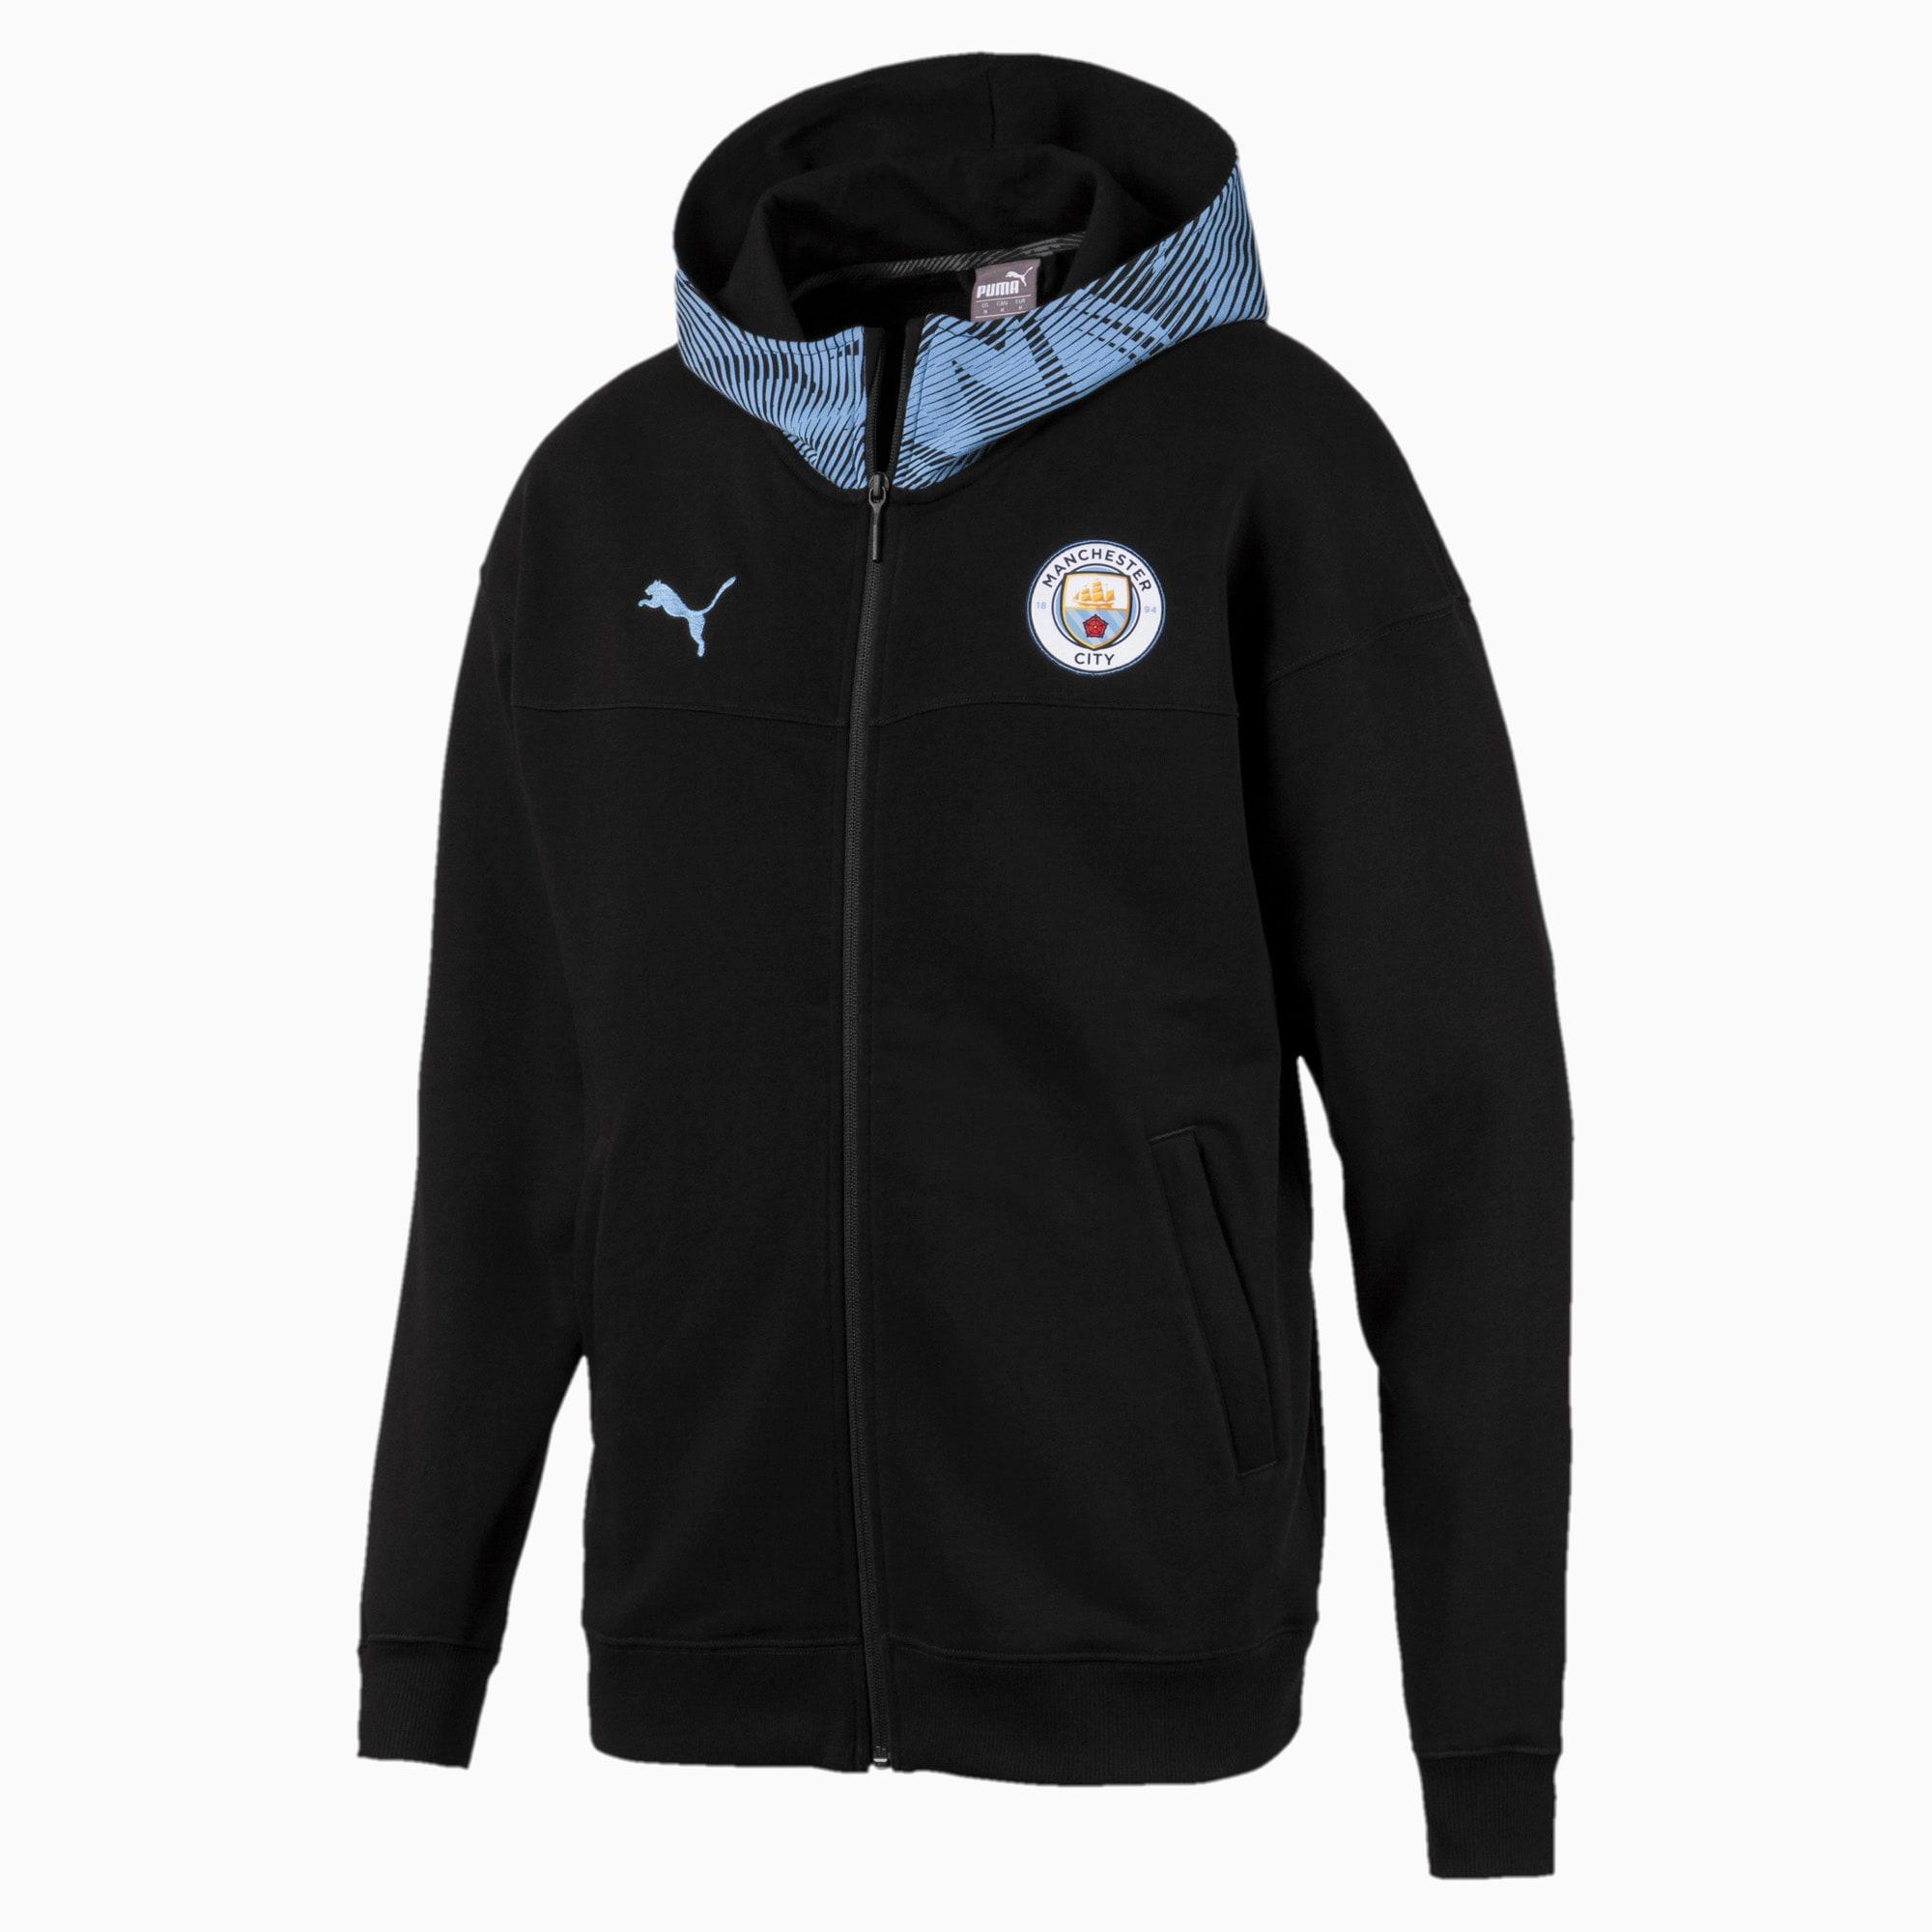 Man City Casuals Men's Zip-Thru Hoodie | PUMA Manchester City